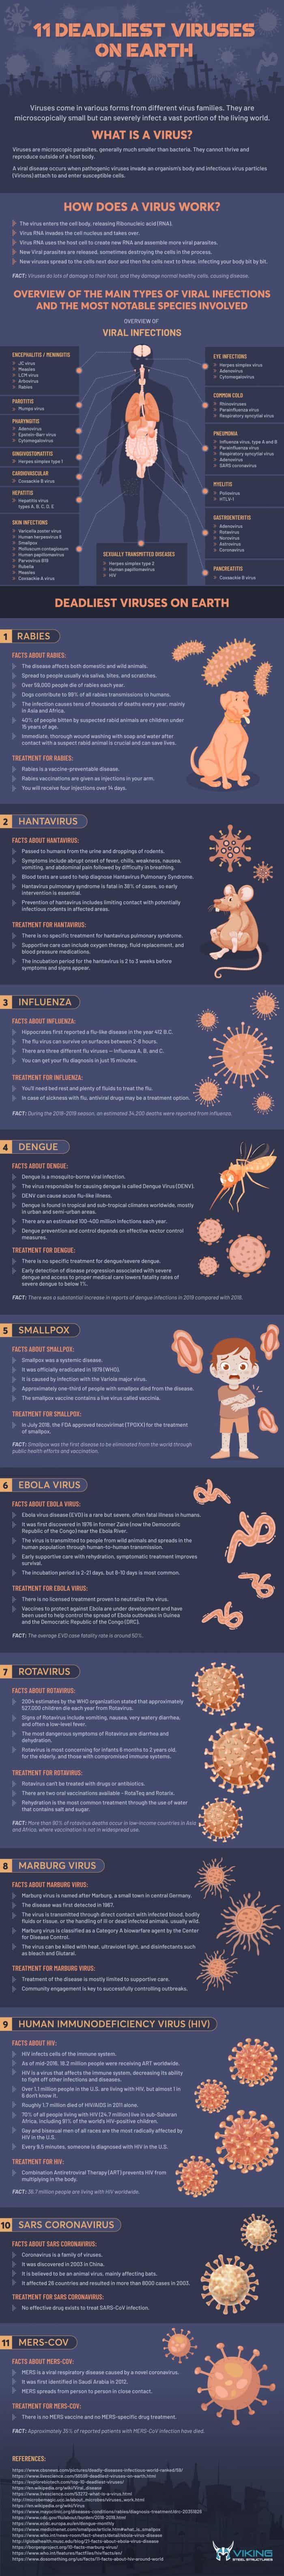 11 Deadliest Viruses